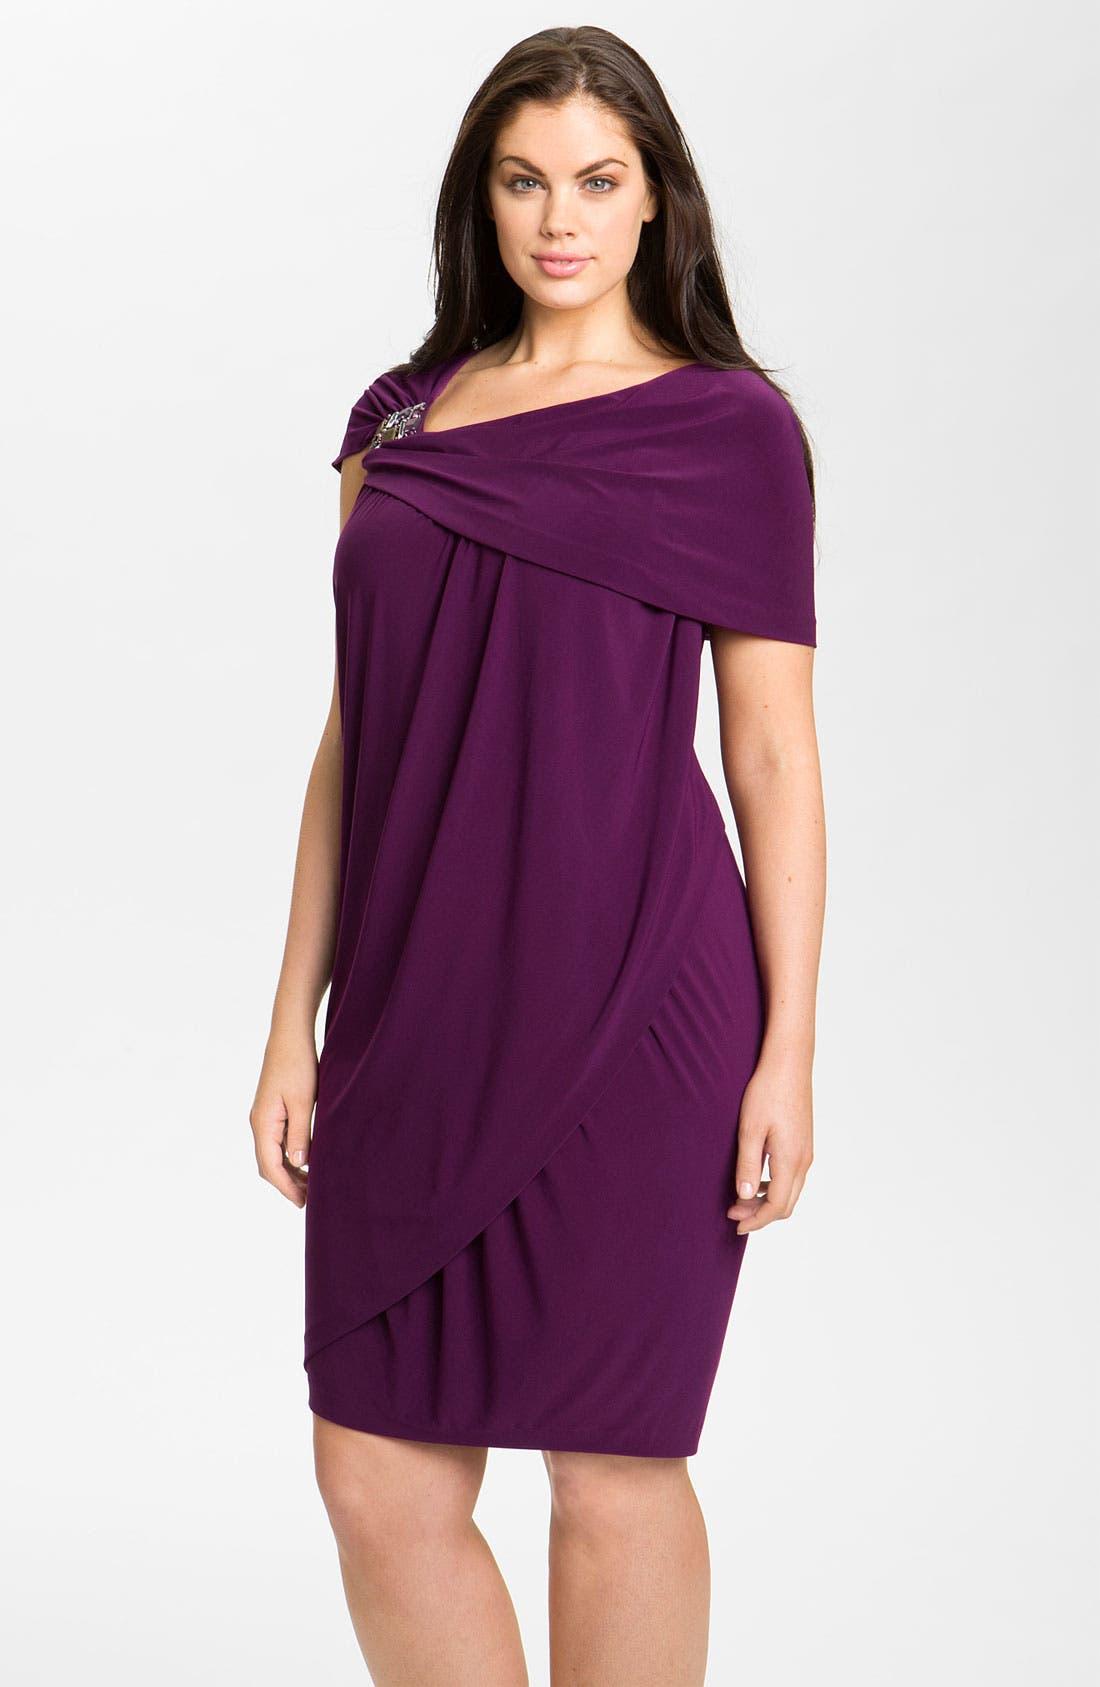 Main Image - Alex & Eve Beaded Jersey Dress (Plus Size)